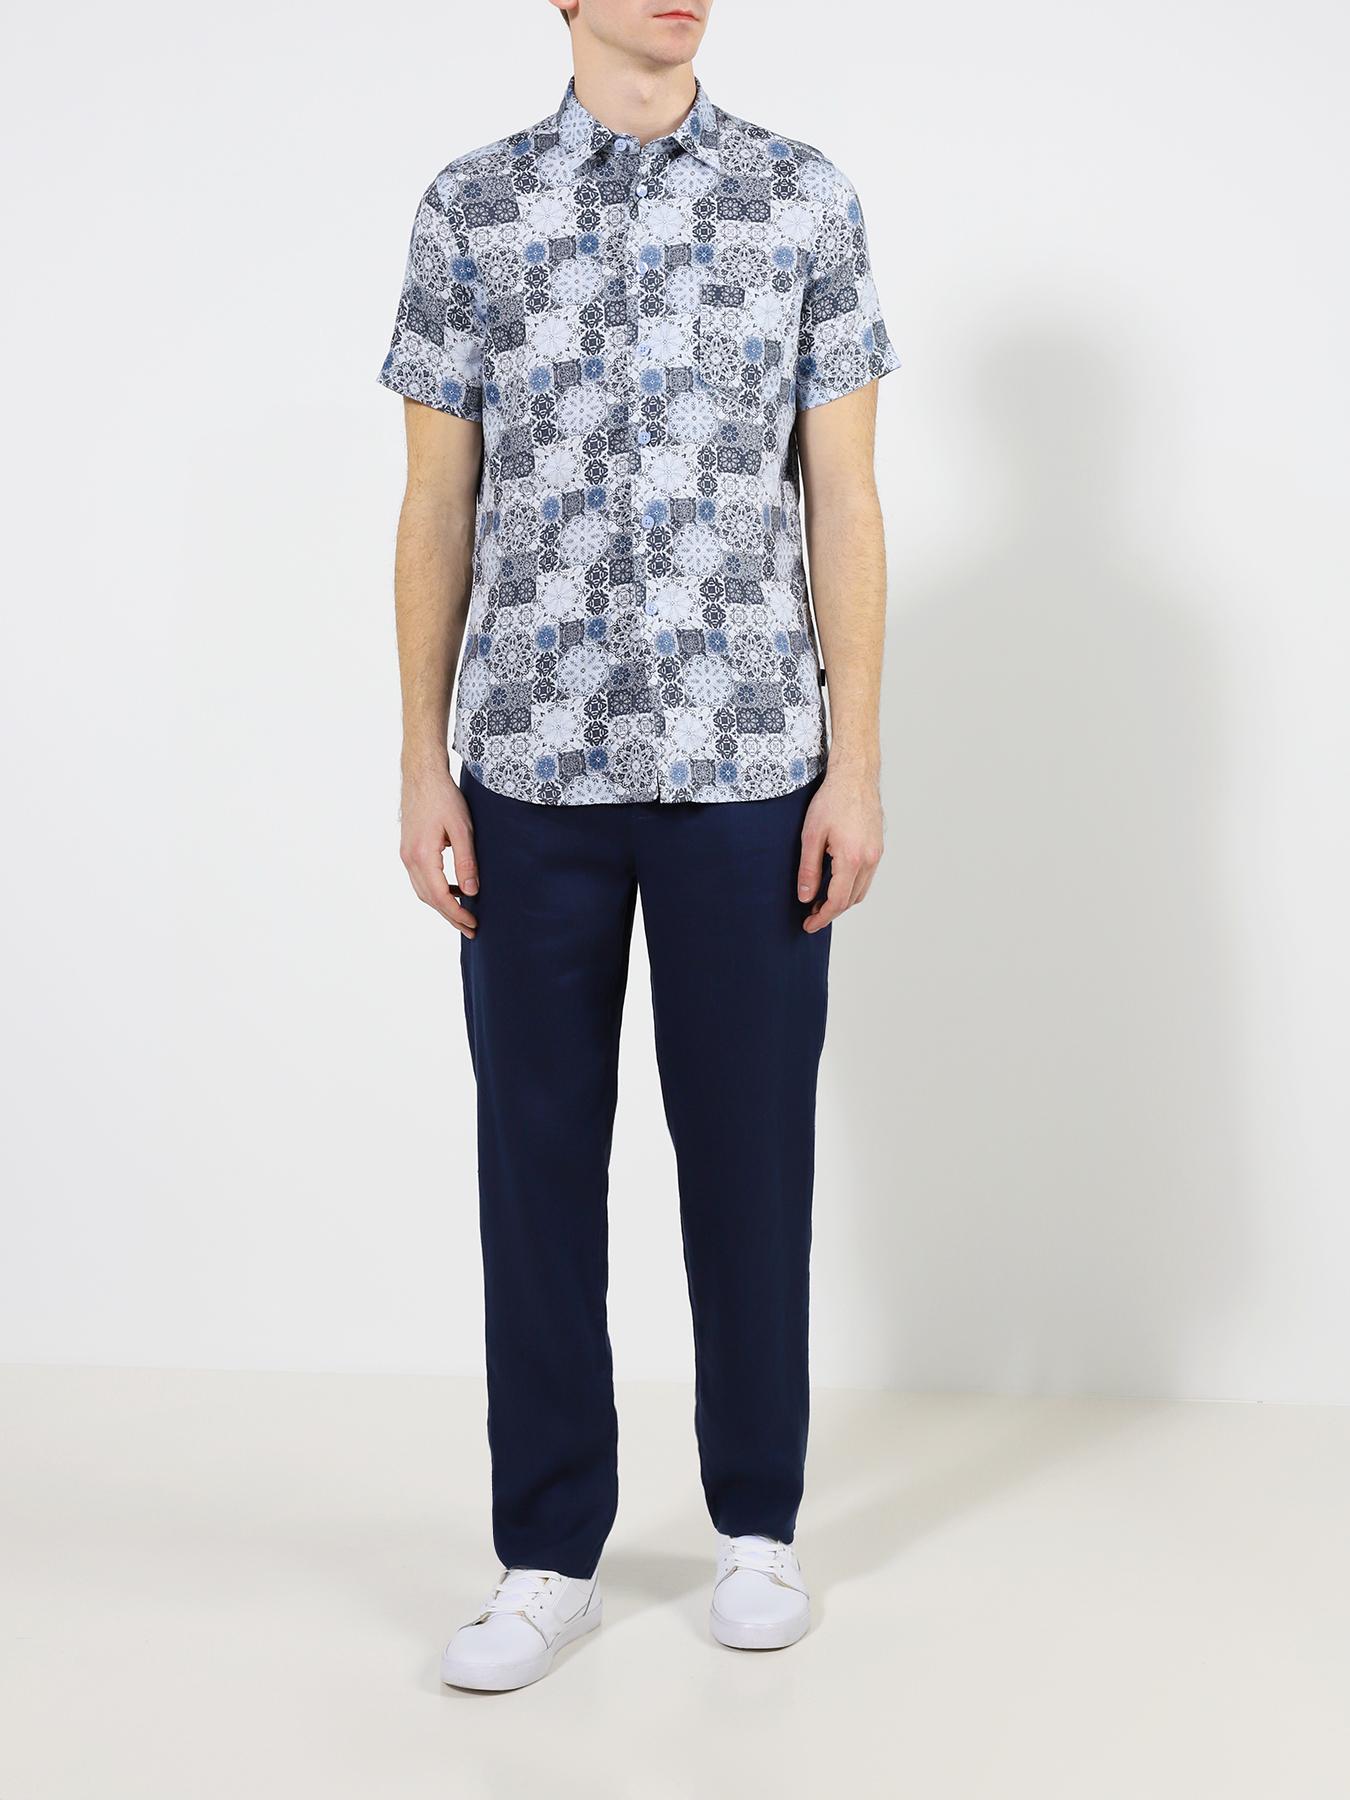 Alessandro Manzoni Jeans Мужская рубашка фото